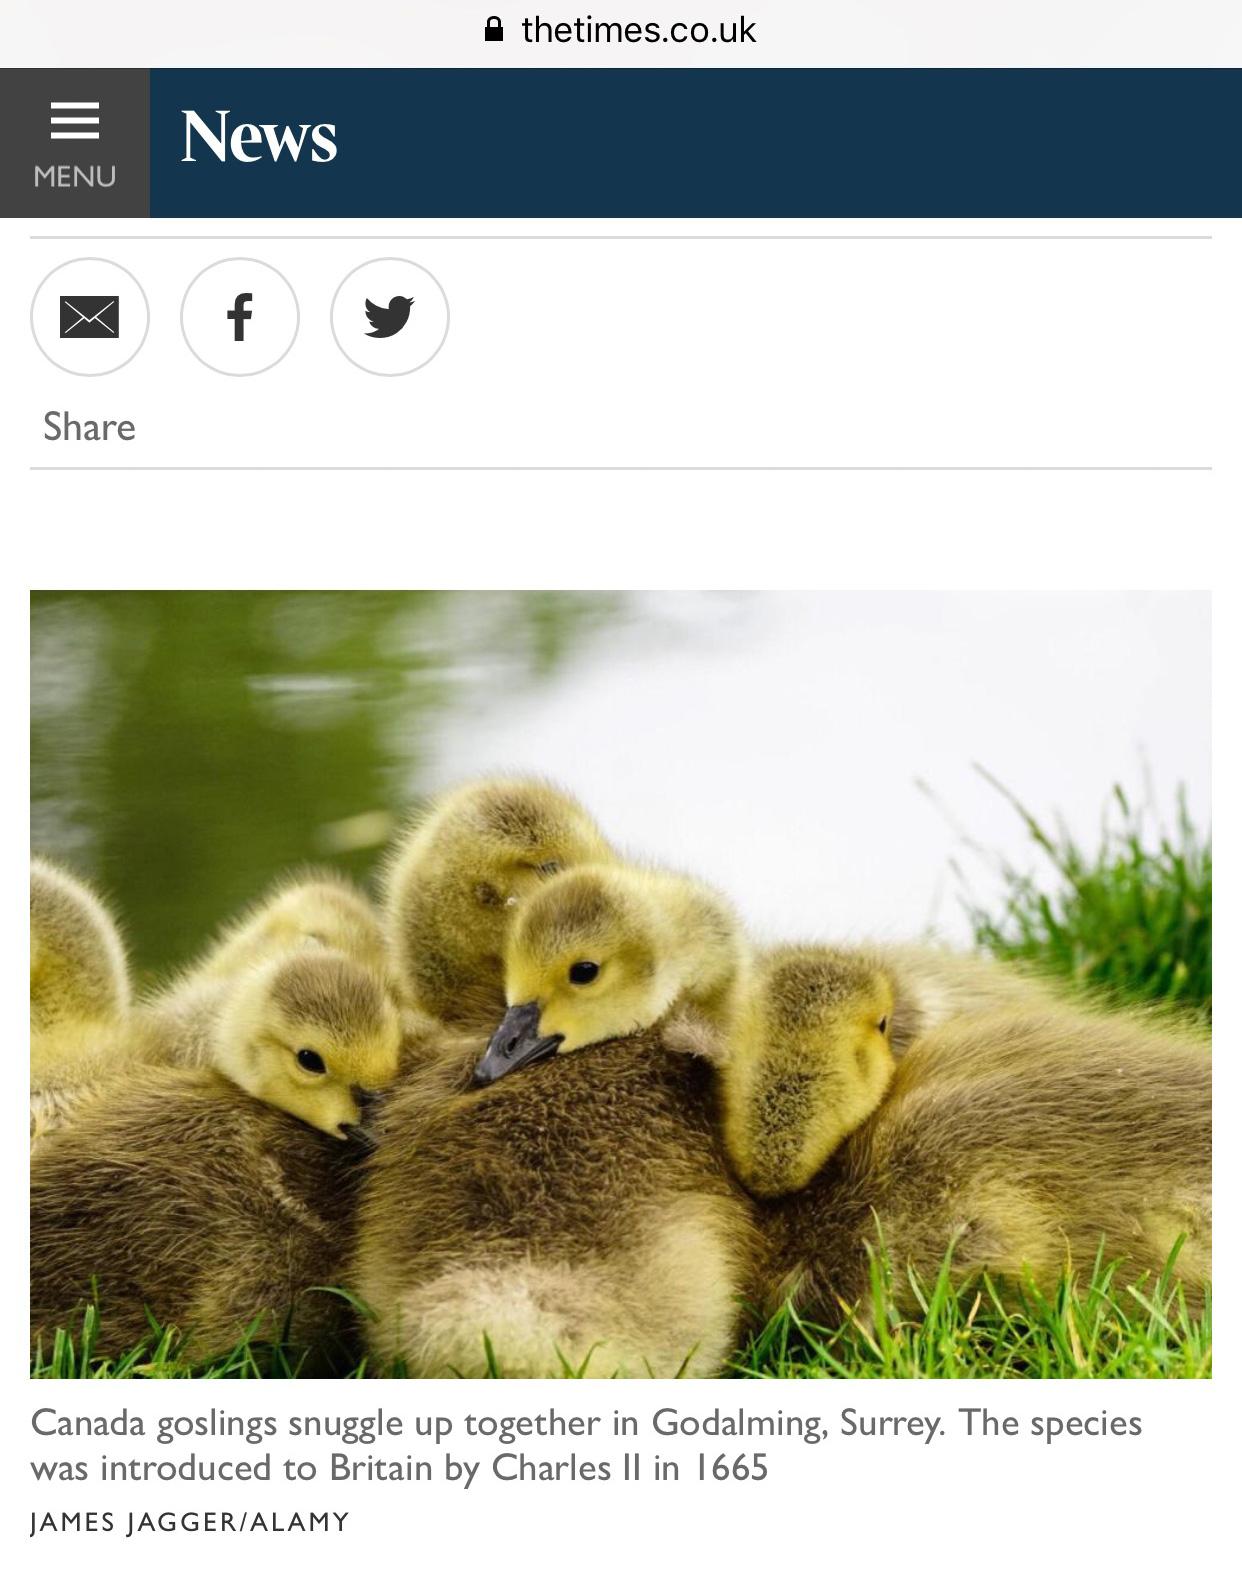 canada goslings in Godalming Surrey